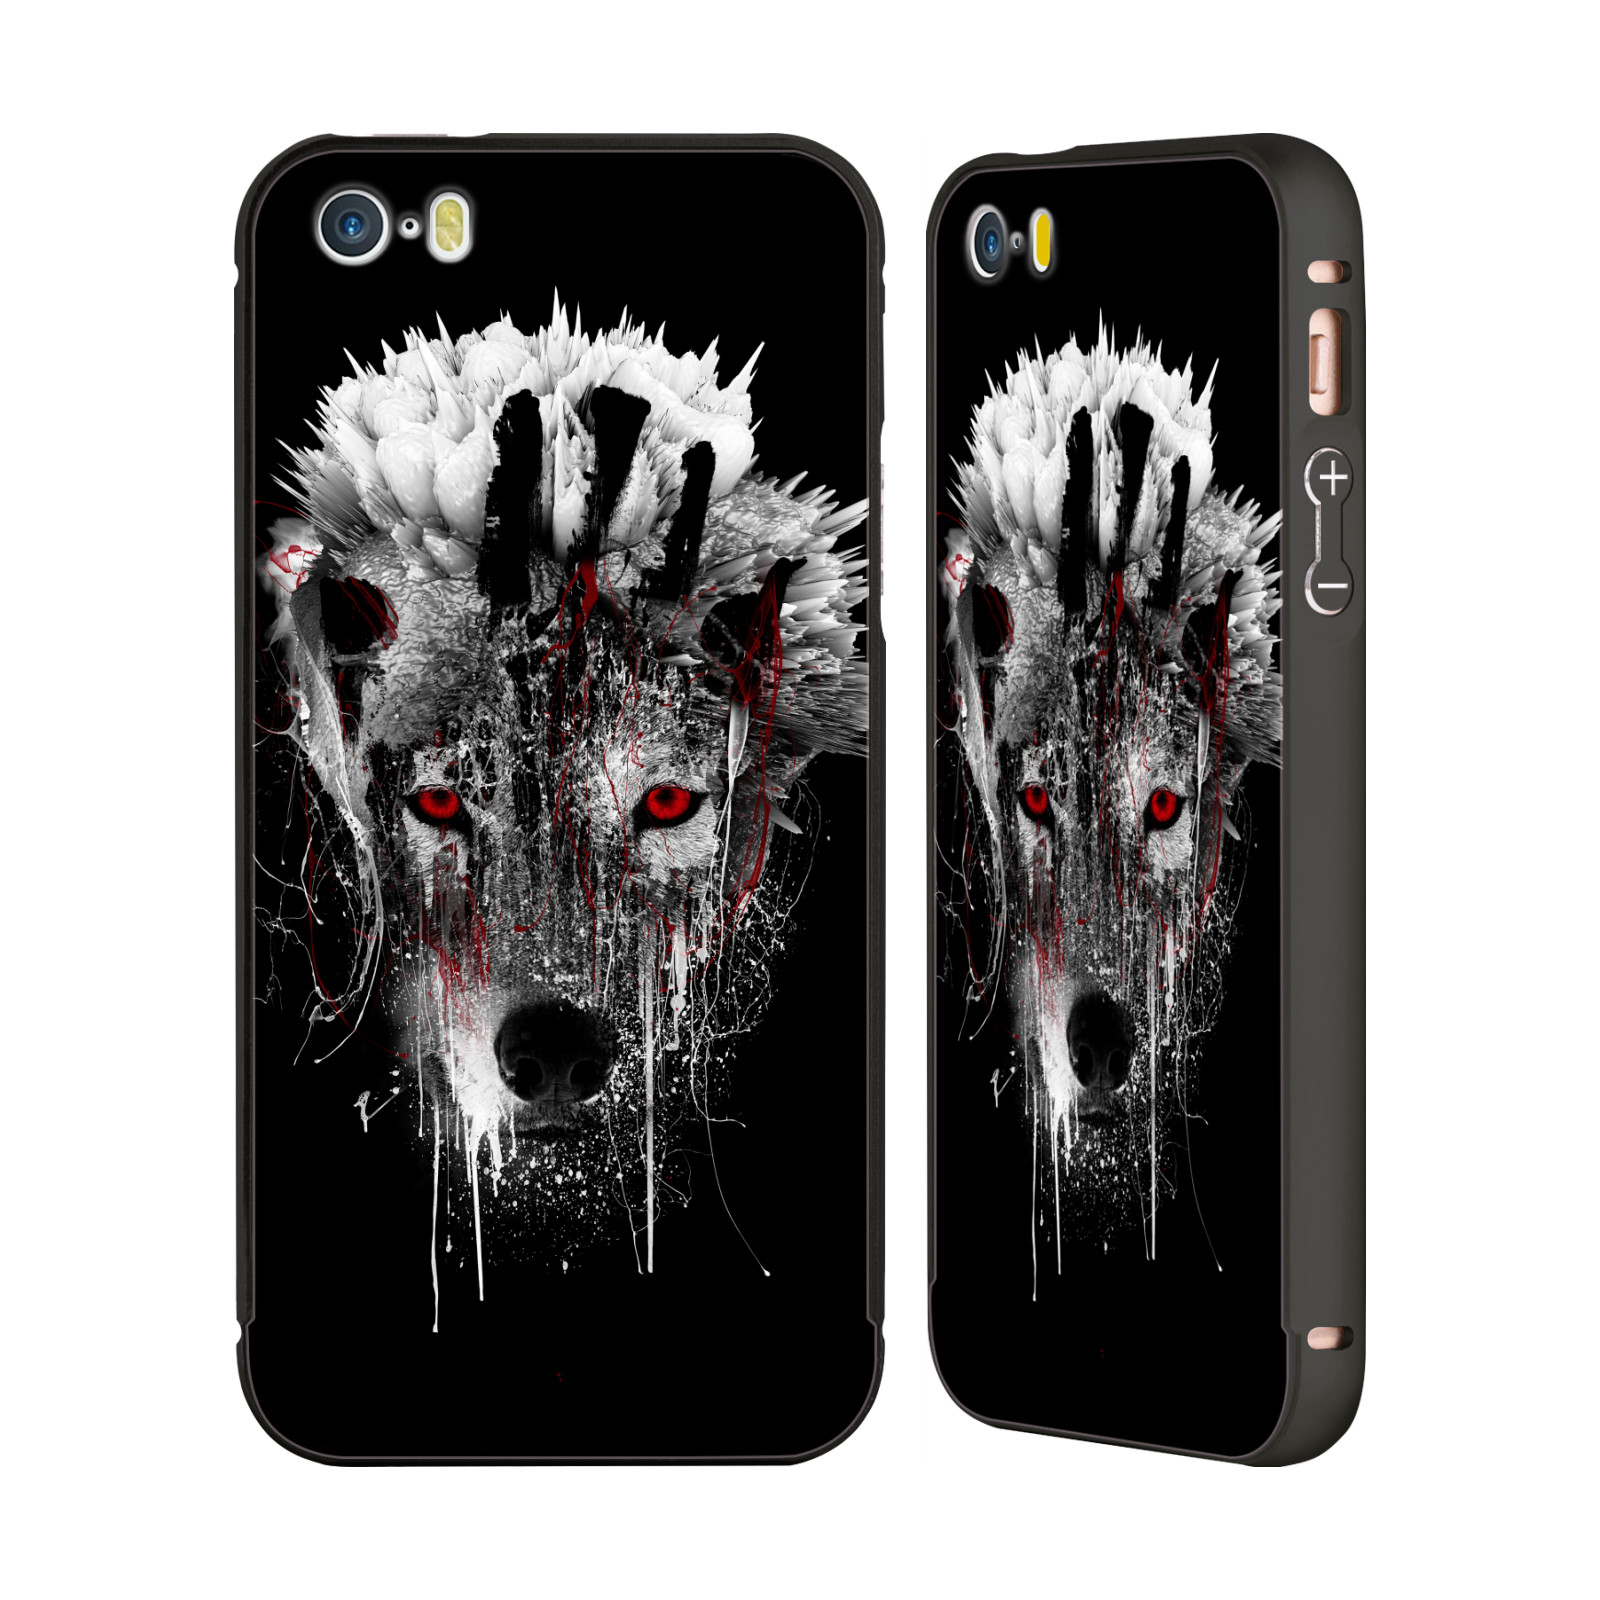 OFFICIAL-RIZA-PEKER-ANIMALS-3-BLACK-BUMPER-SLIDER-CASE-FOR-APPLE-iPHONE-PHONES